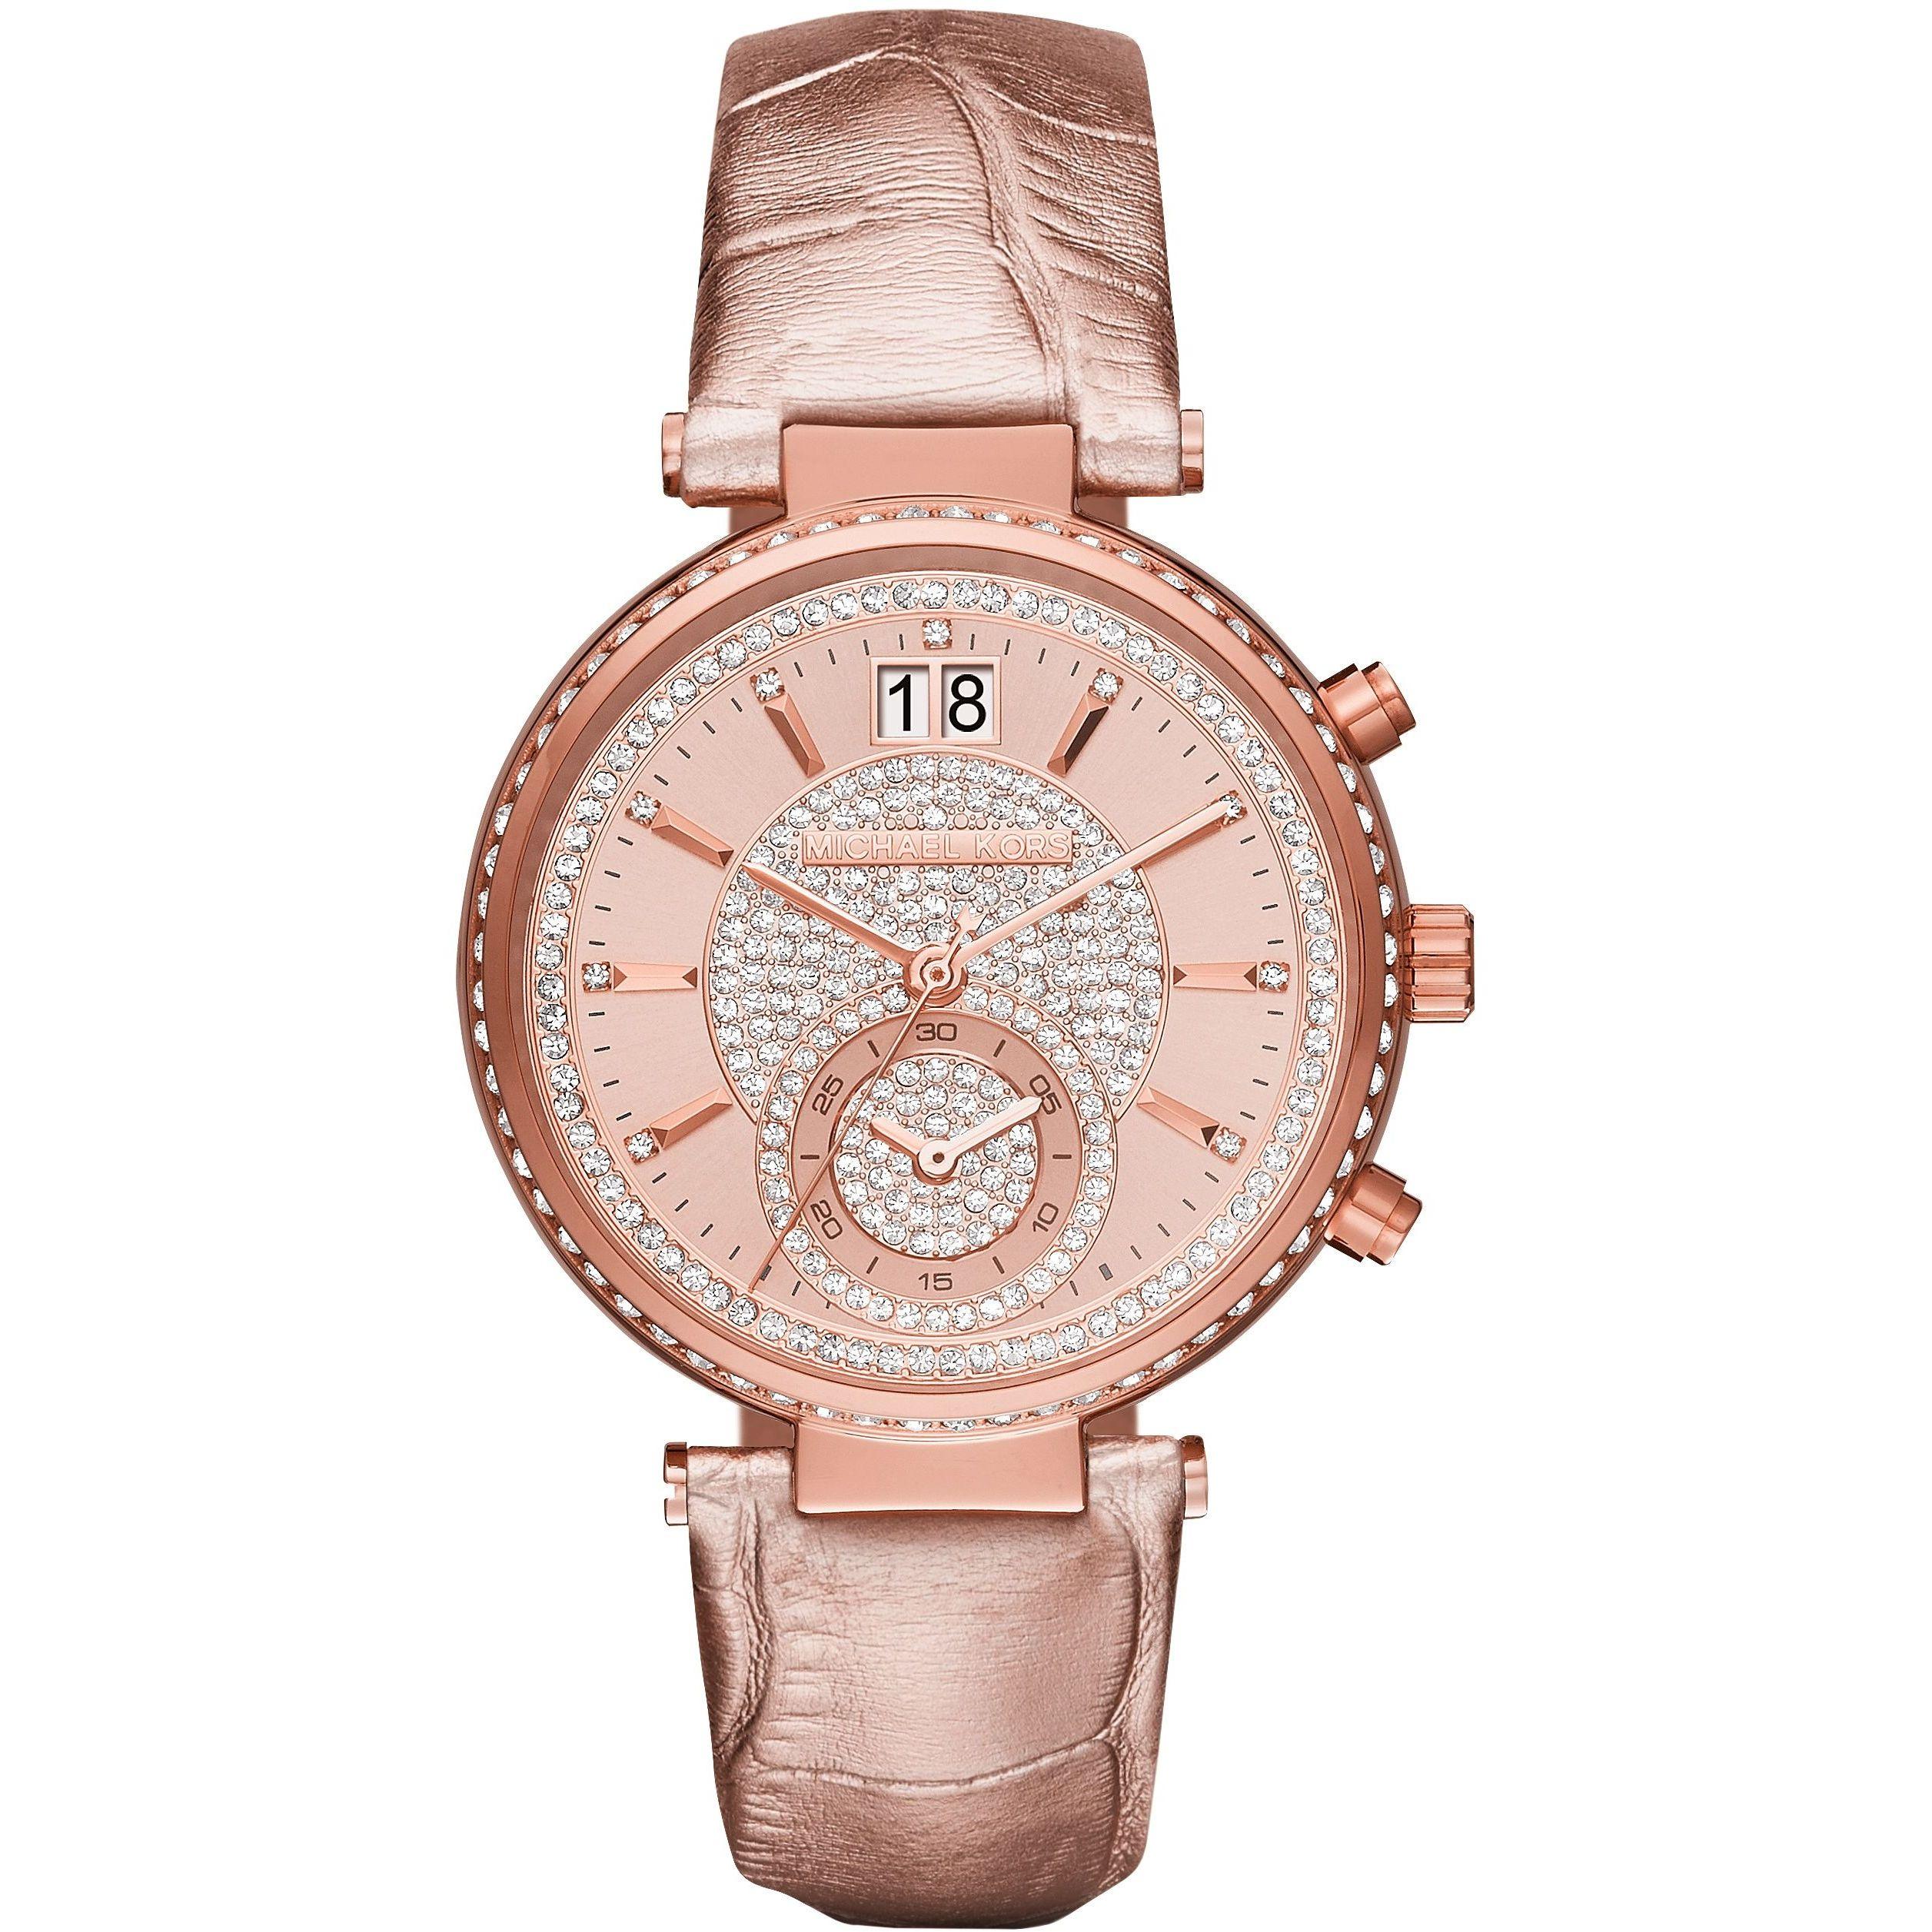 dfa161fe9 Ladies Michael Kors Sawyer Chronograph Watch (MK2445) | WatchShop.com™